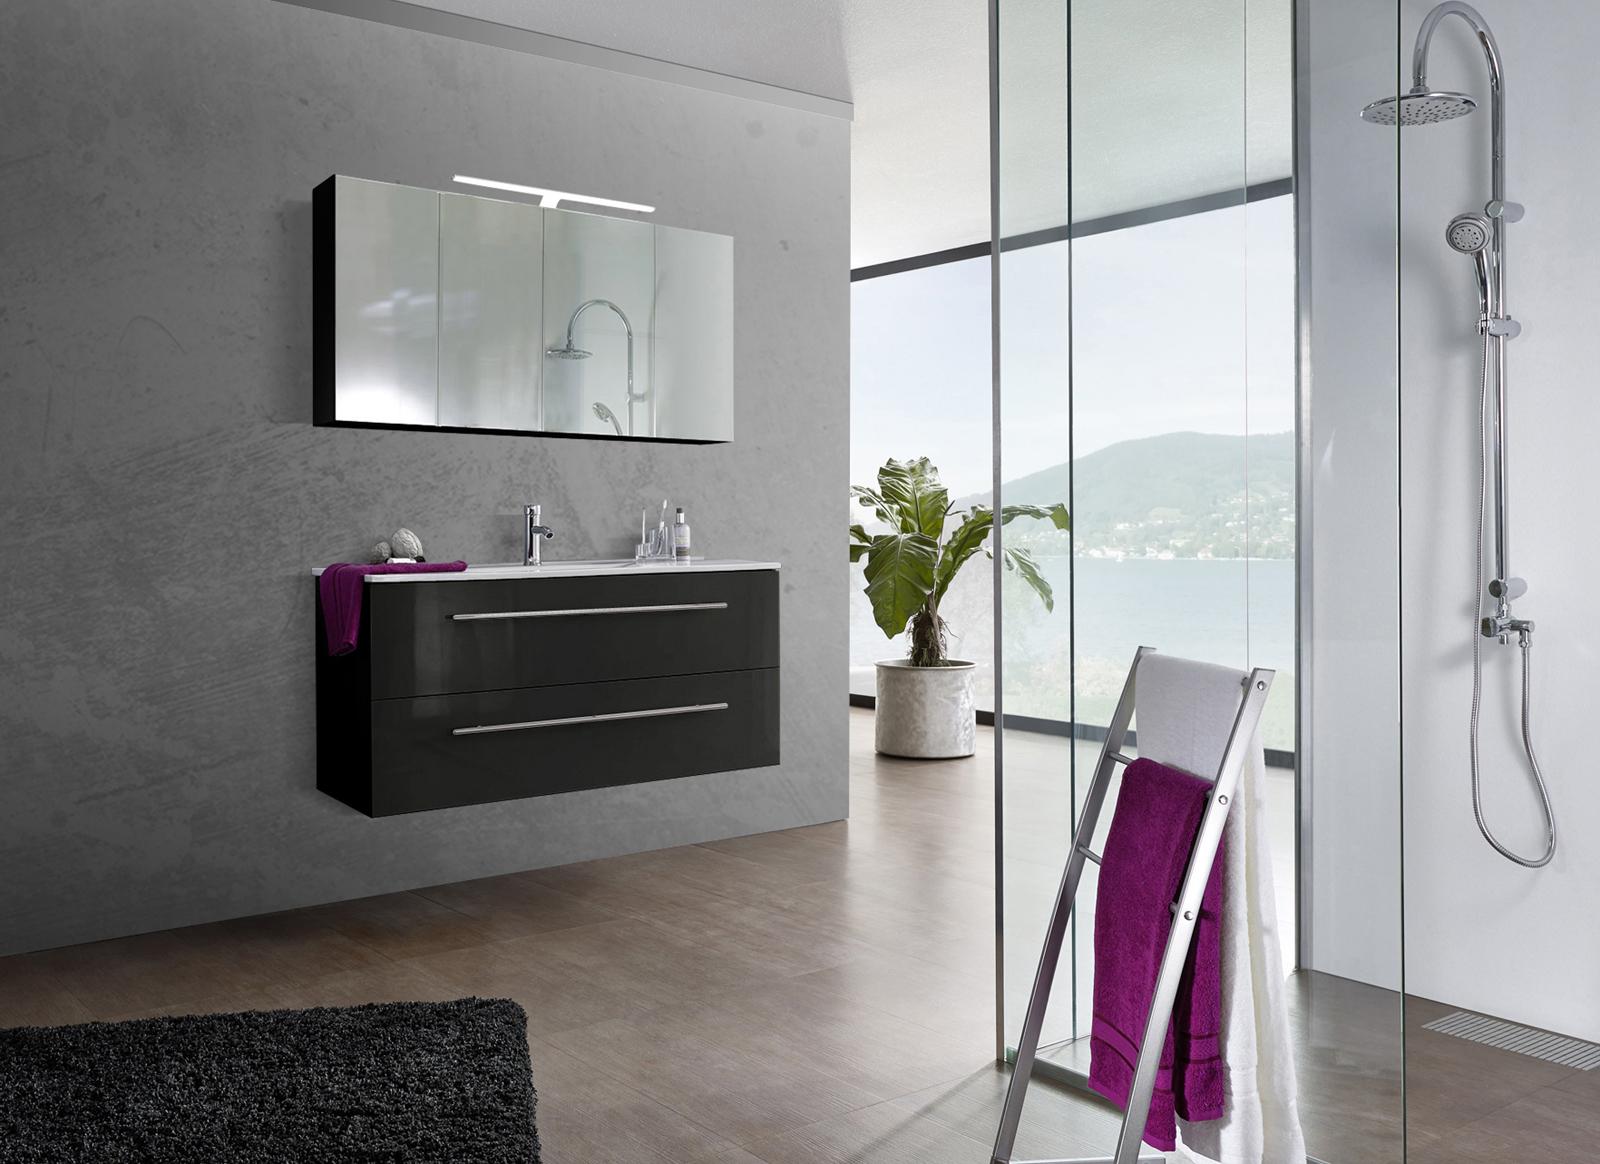 sam 2tlg badezimmer set spiegelschrank schwarz 120 cm verena auf lager. Black Bedroom Furniture Sets. Home Design Ideas